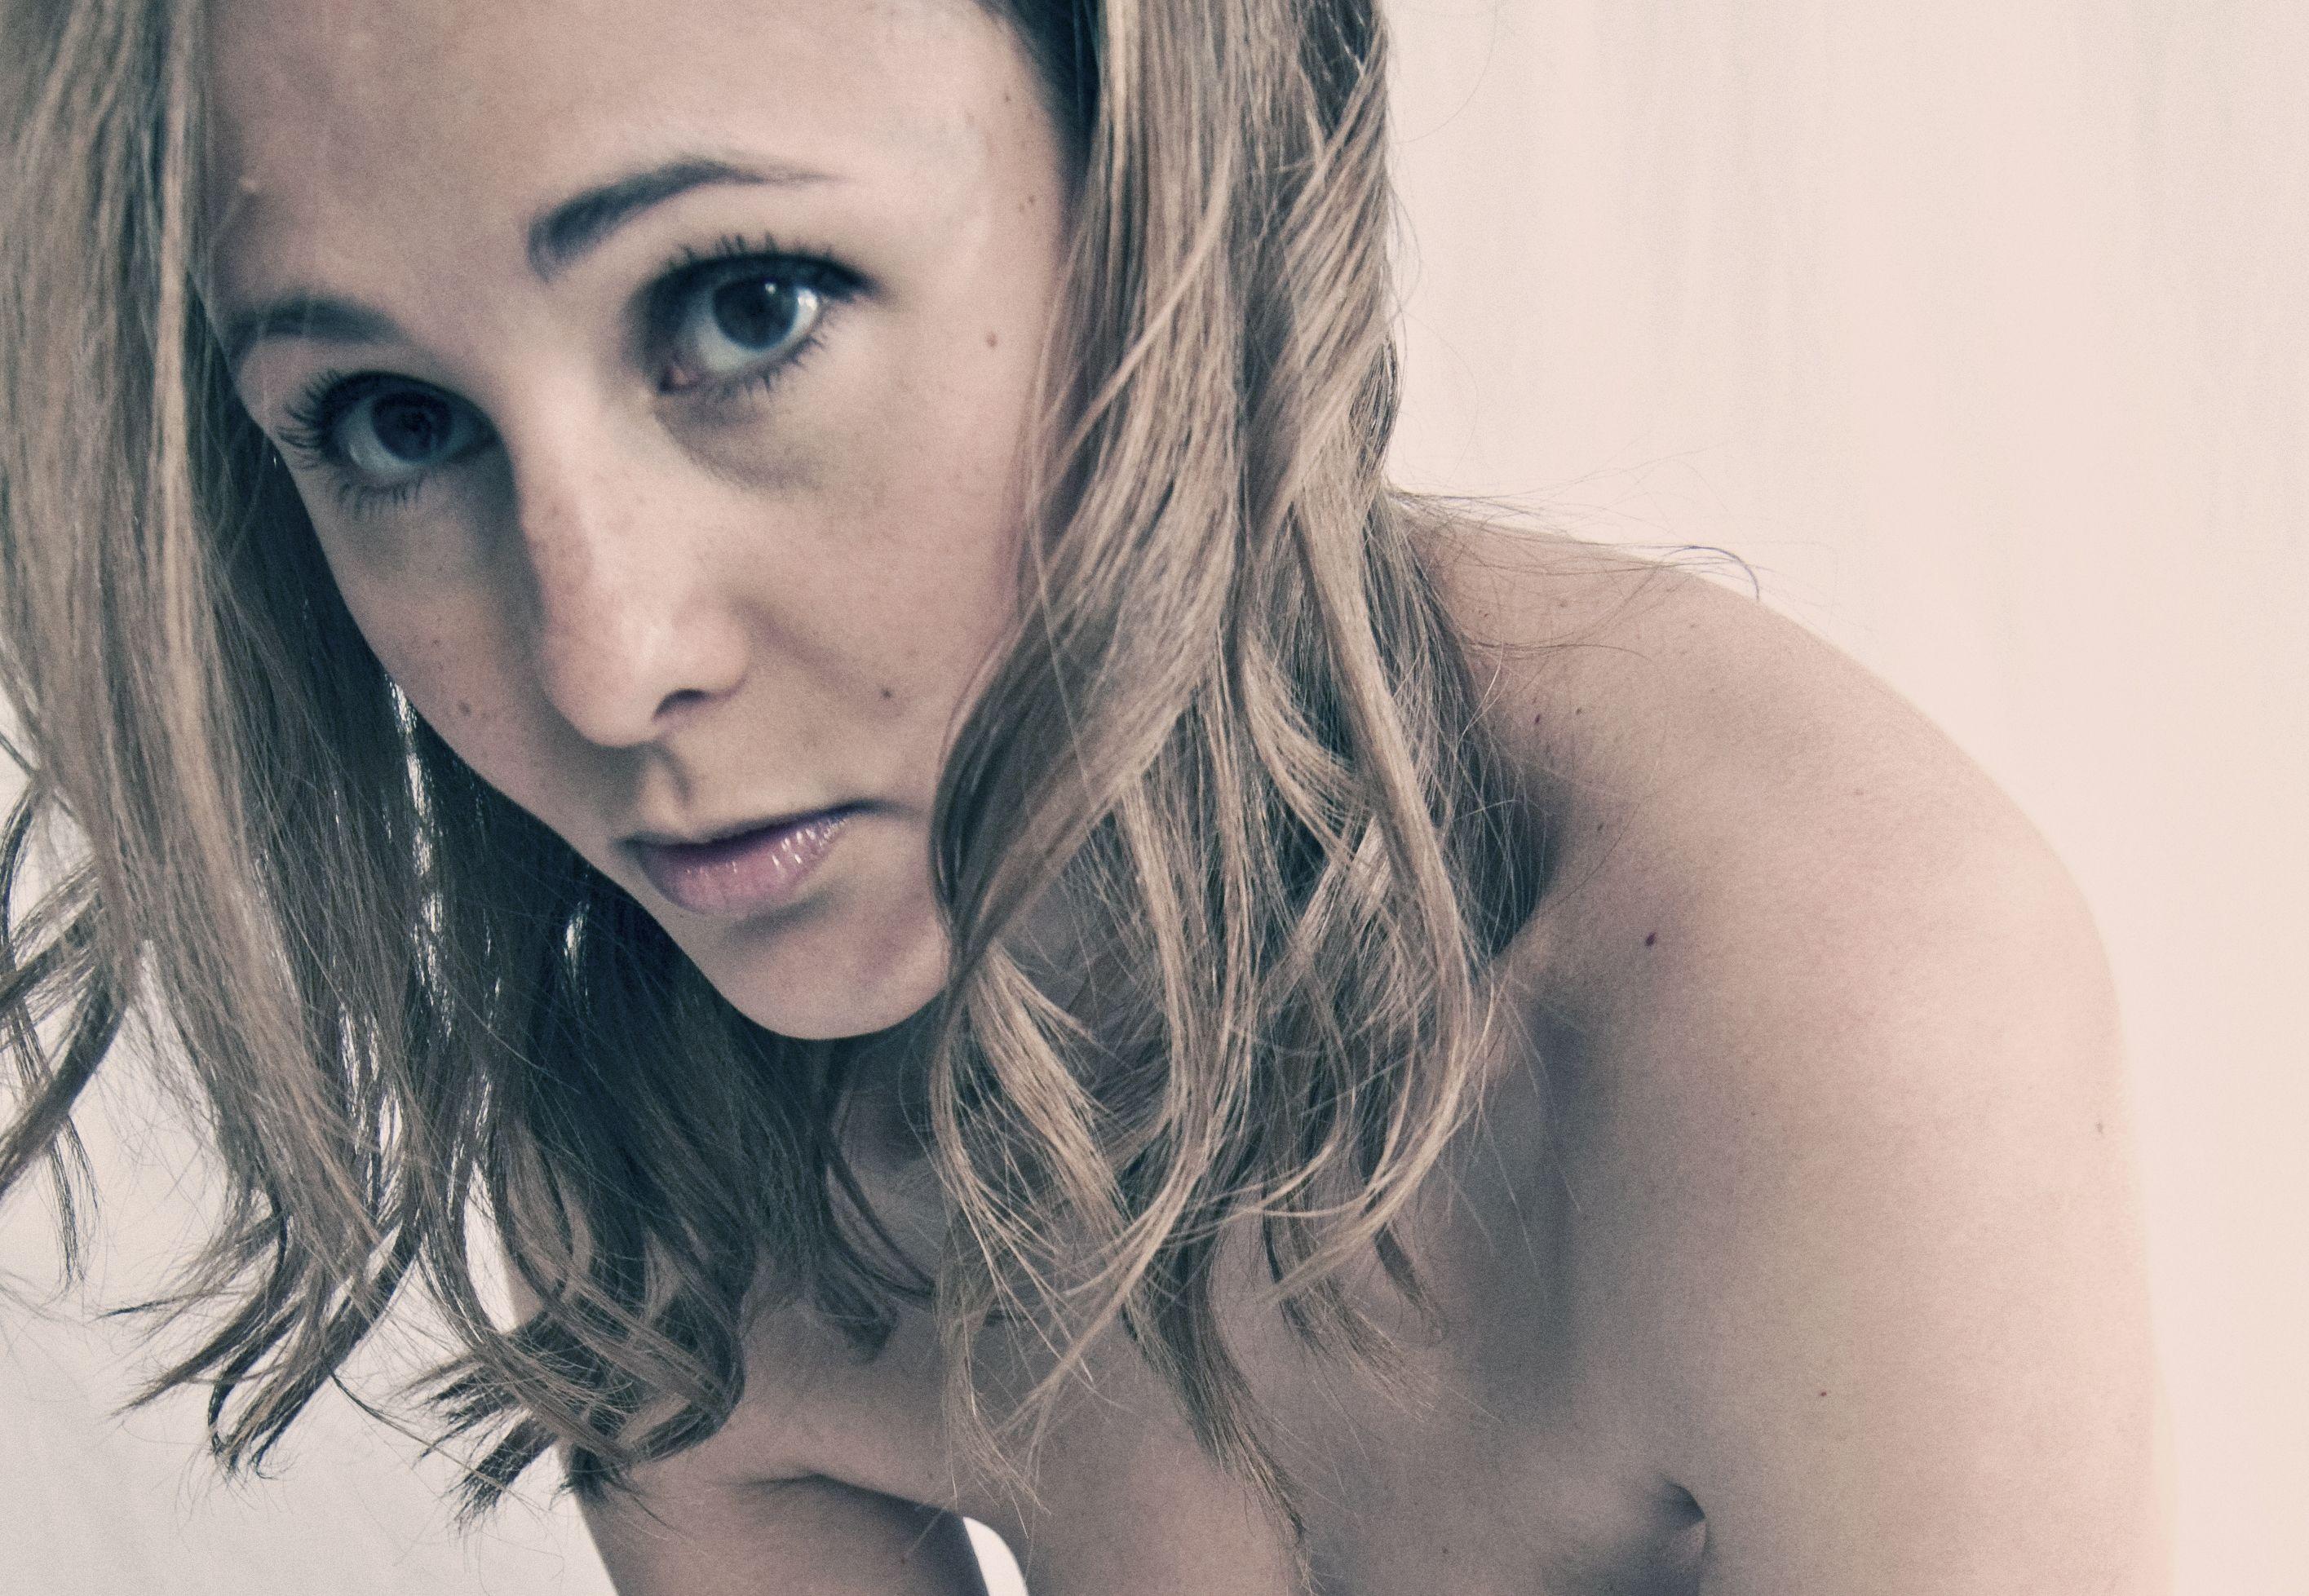 Images Liz LaPoint nude (93 photo), Topless, Sideboobs, Boobs, underwear 2006